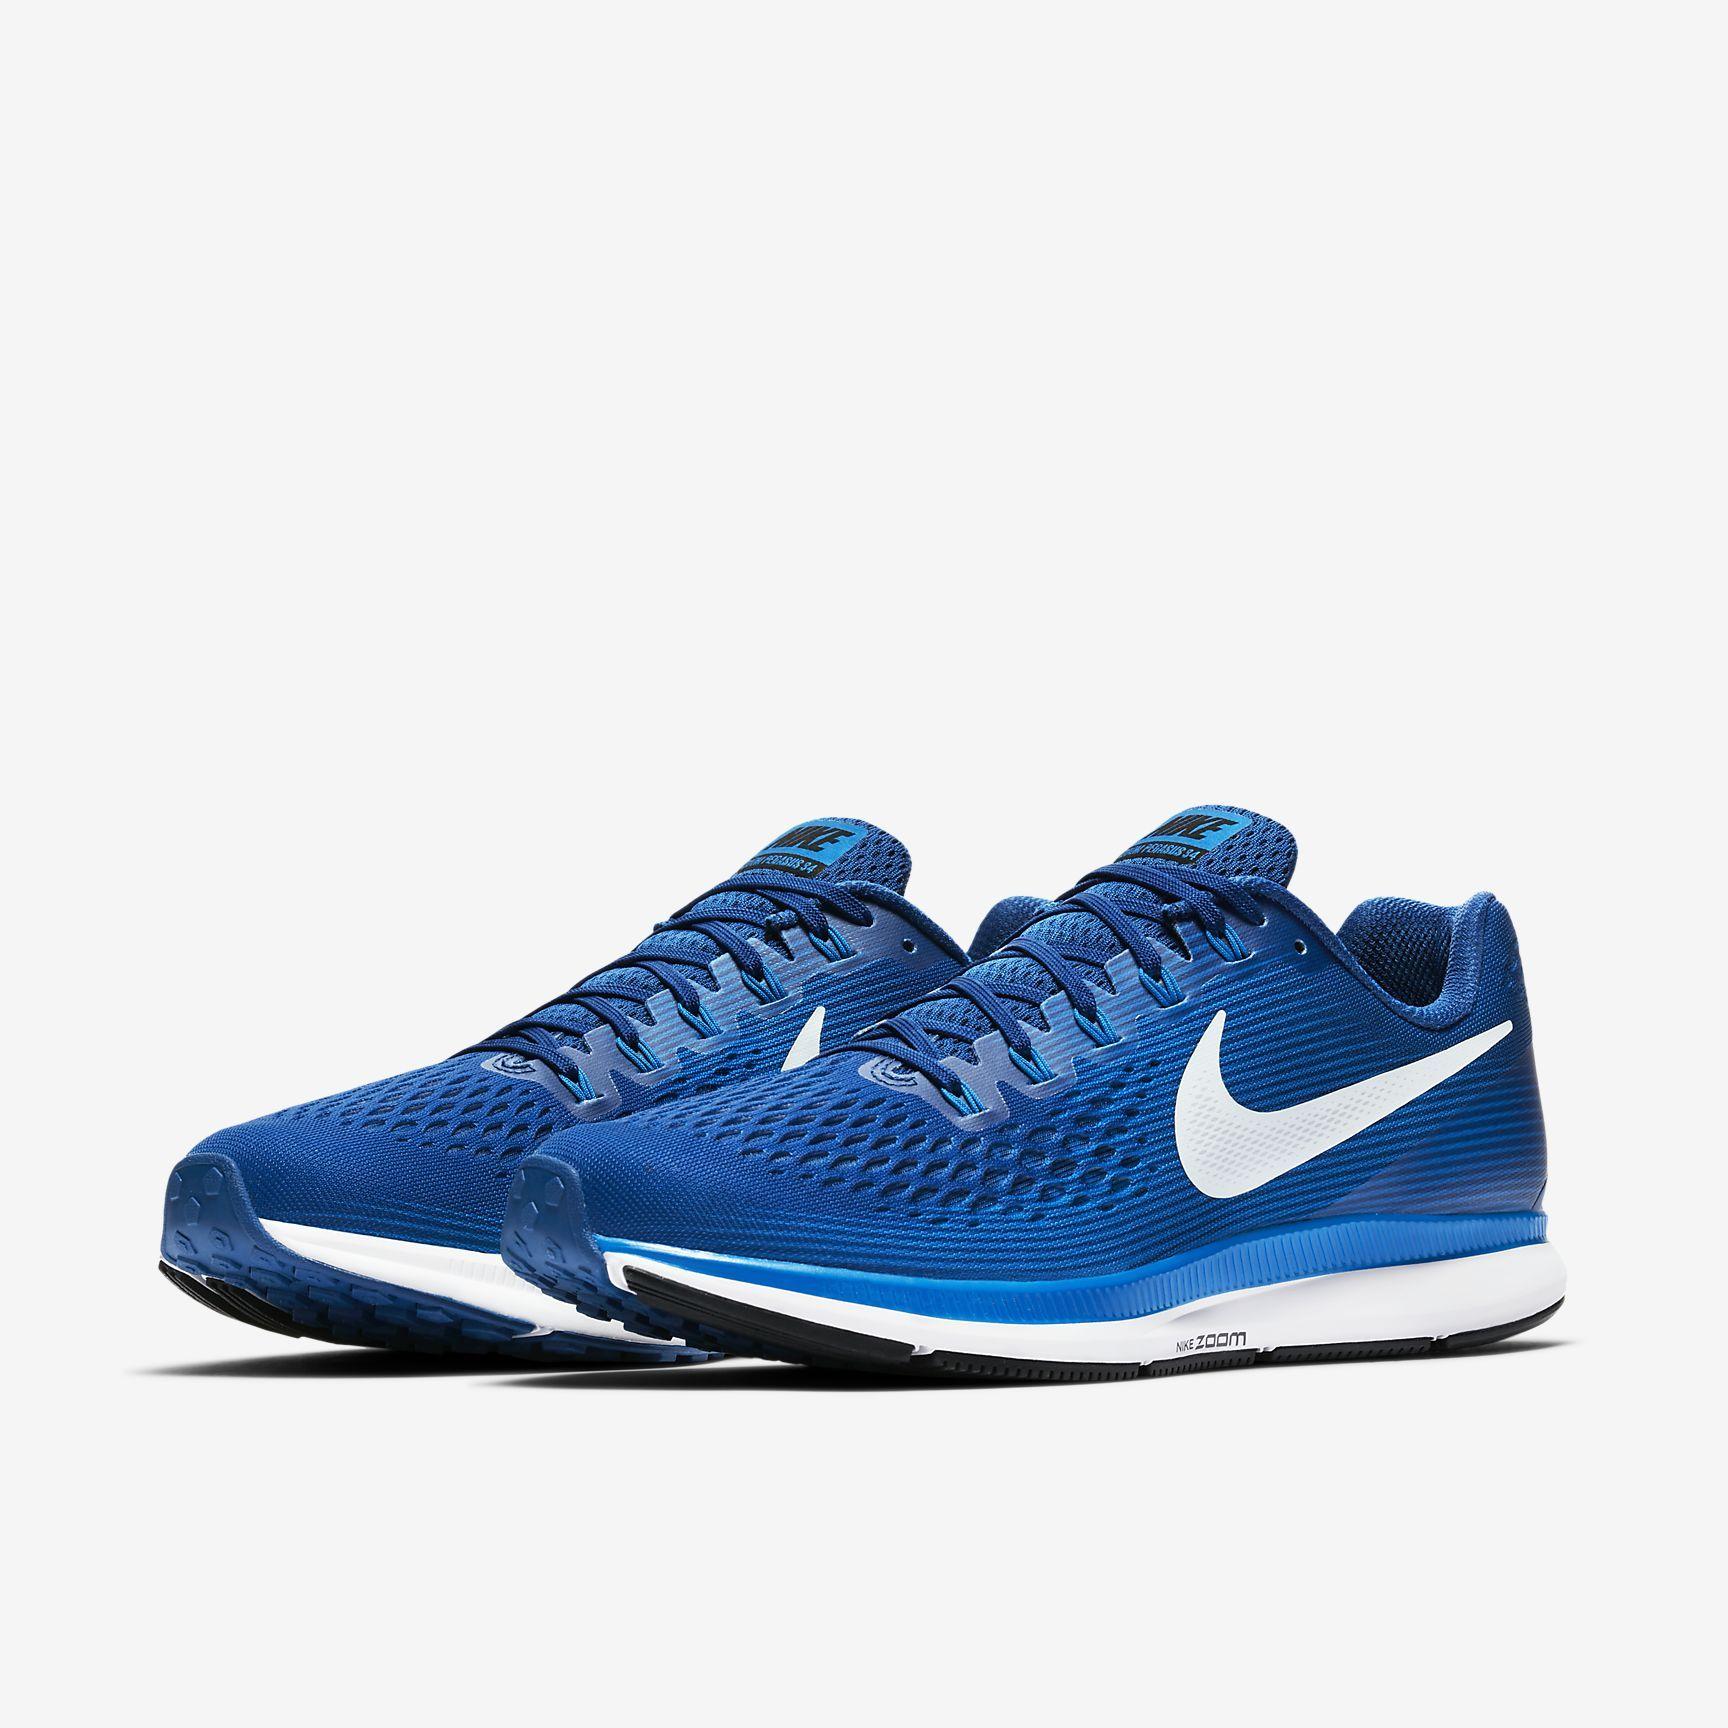 Nike Air Zoom Pegasus 34 Gym Blue Sku 880555 401 Lien Hệ Fb Com Usshoes Trangchu Hoặc 642a Quang Trung T P Quảng Ngai 0255 3717 227